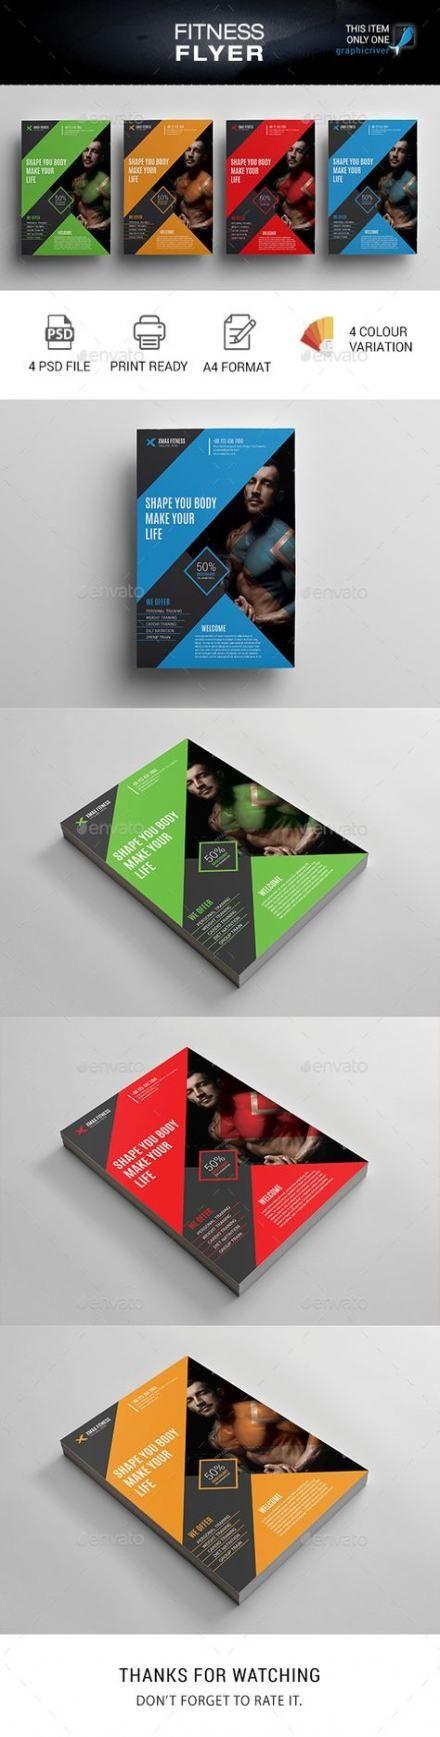 Fitness logo design ideas shape 22 best Ideas #fitness #design